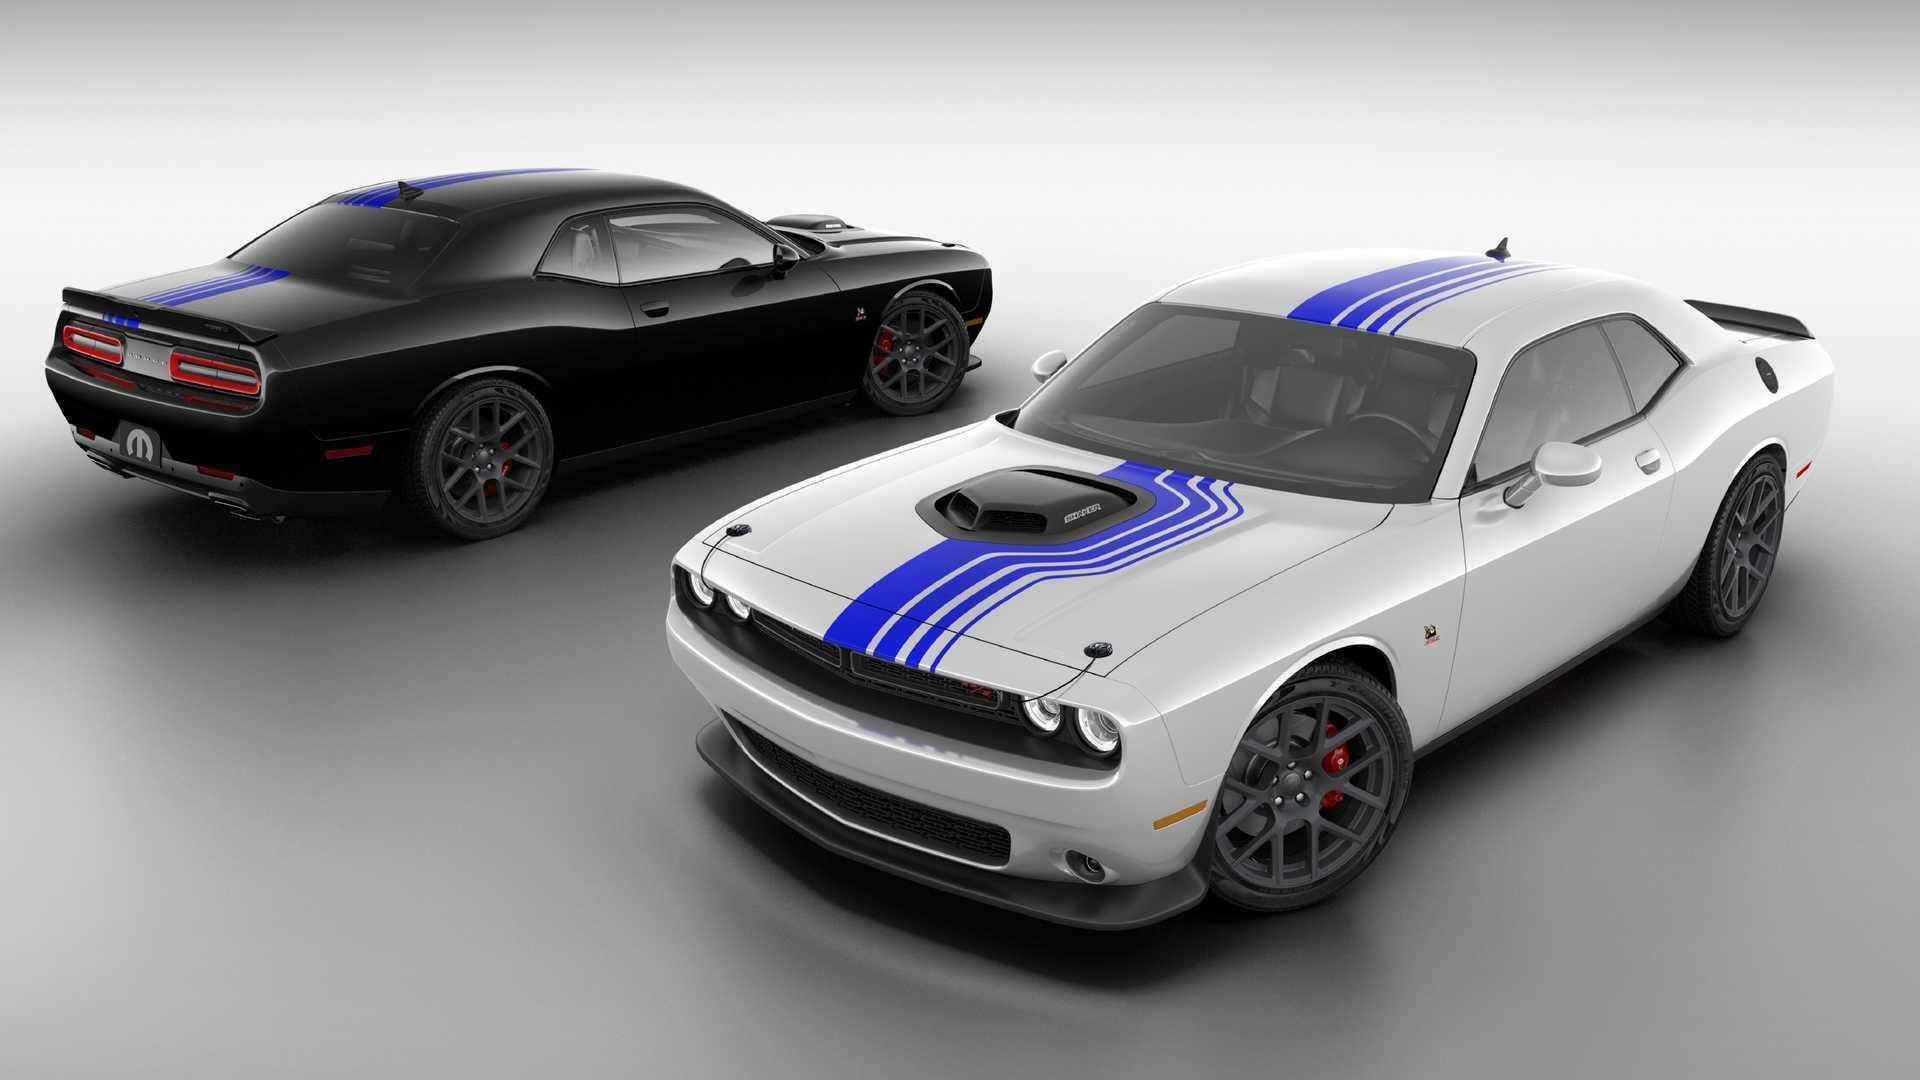 Mopar 19 Dodge Challenger Honors 10 Years Of Factory Tweaked Muscle